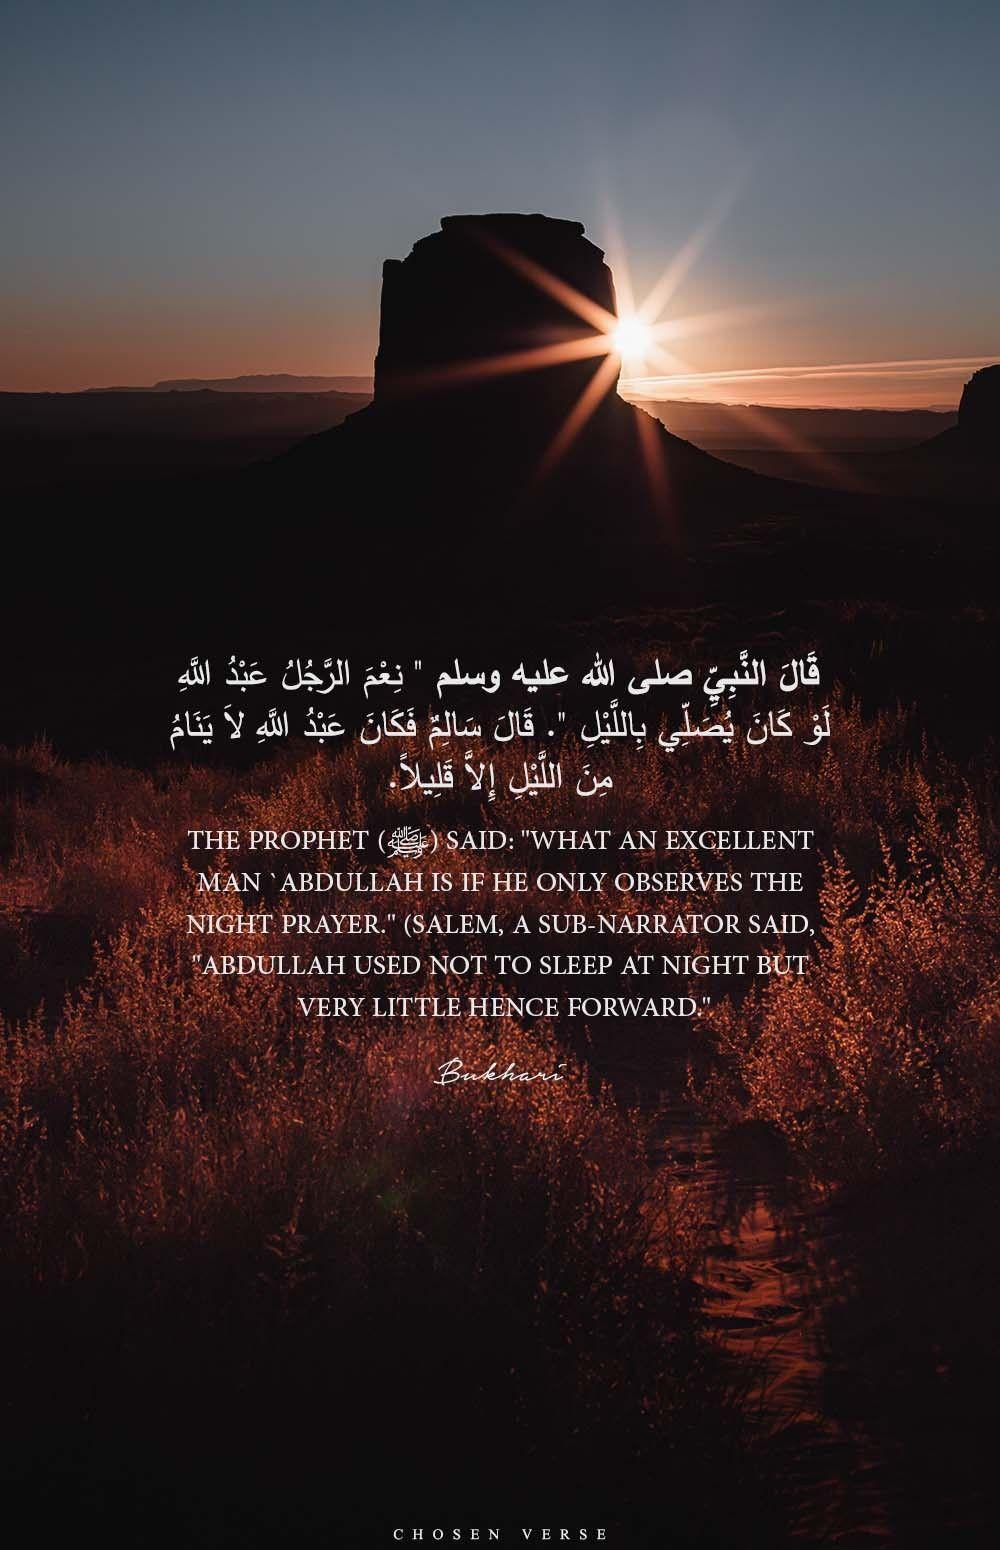 Nader Dawah In 2020 Night Prayer Islamic Quotes In English Sufi Islam